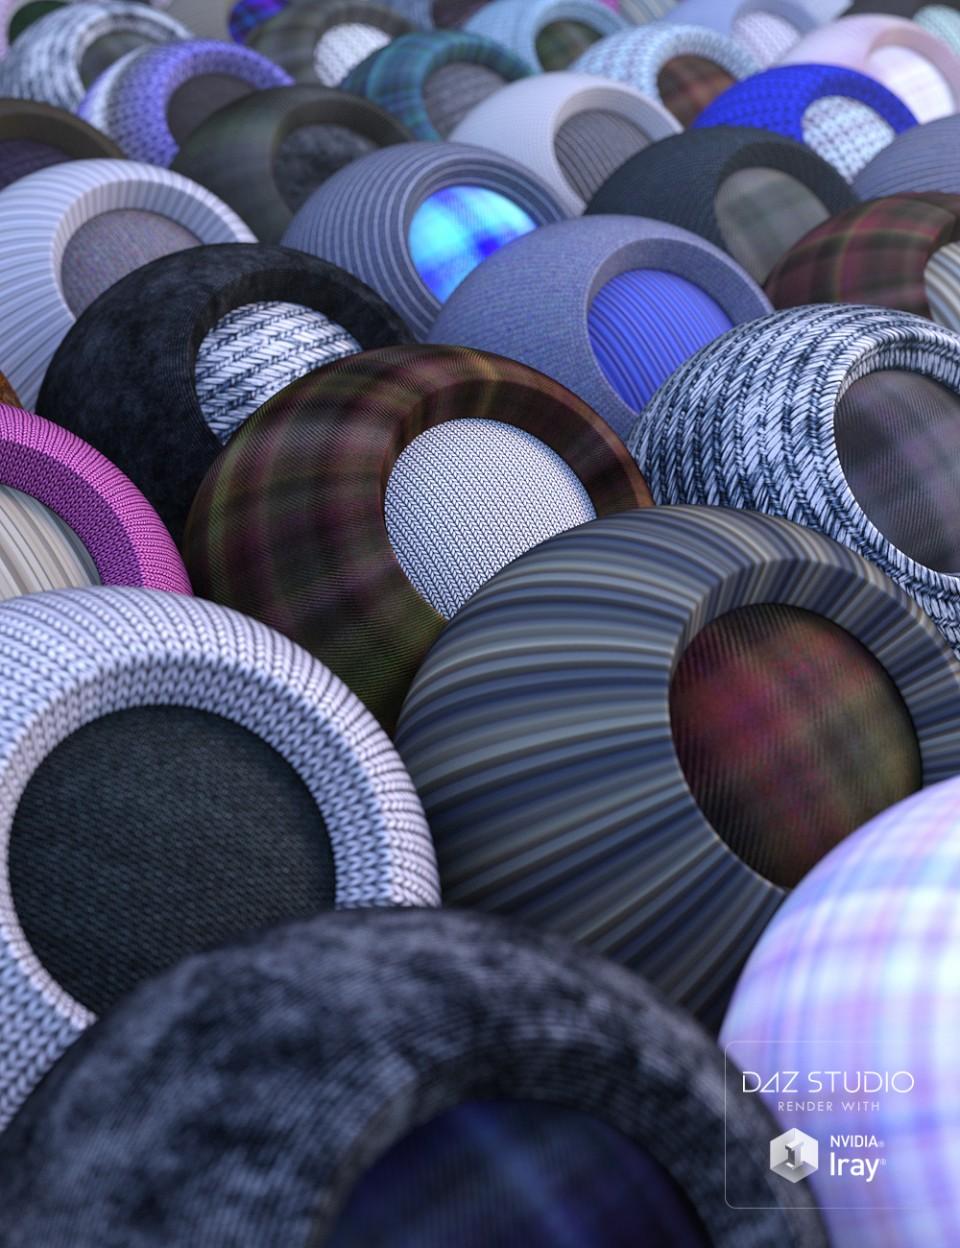 everyday-fabric-shaders-iray